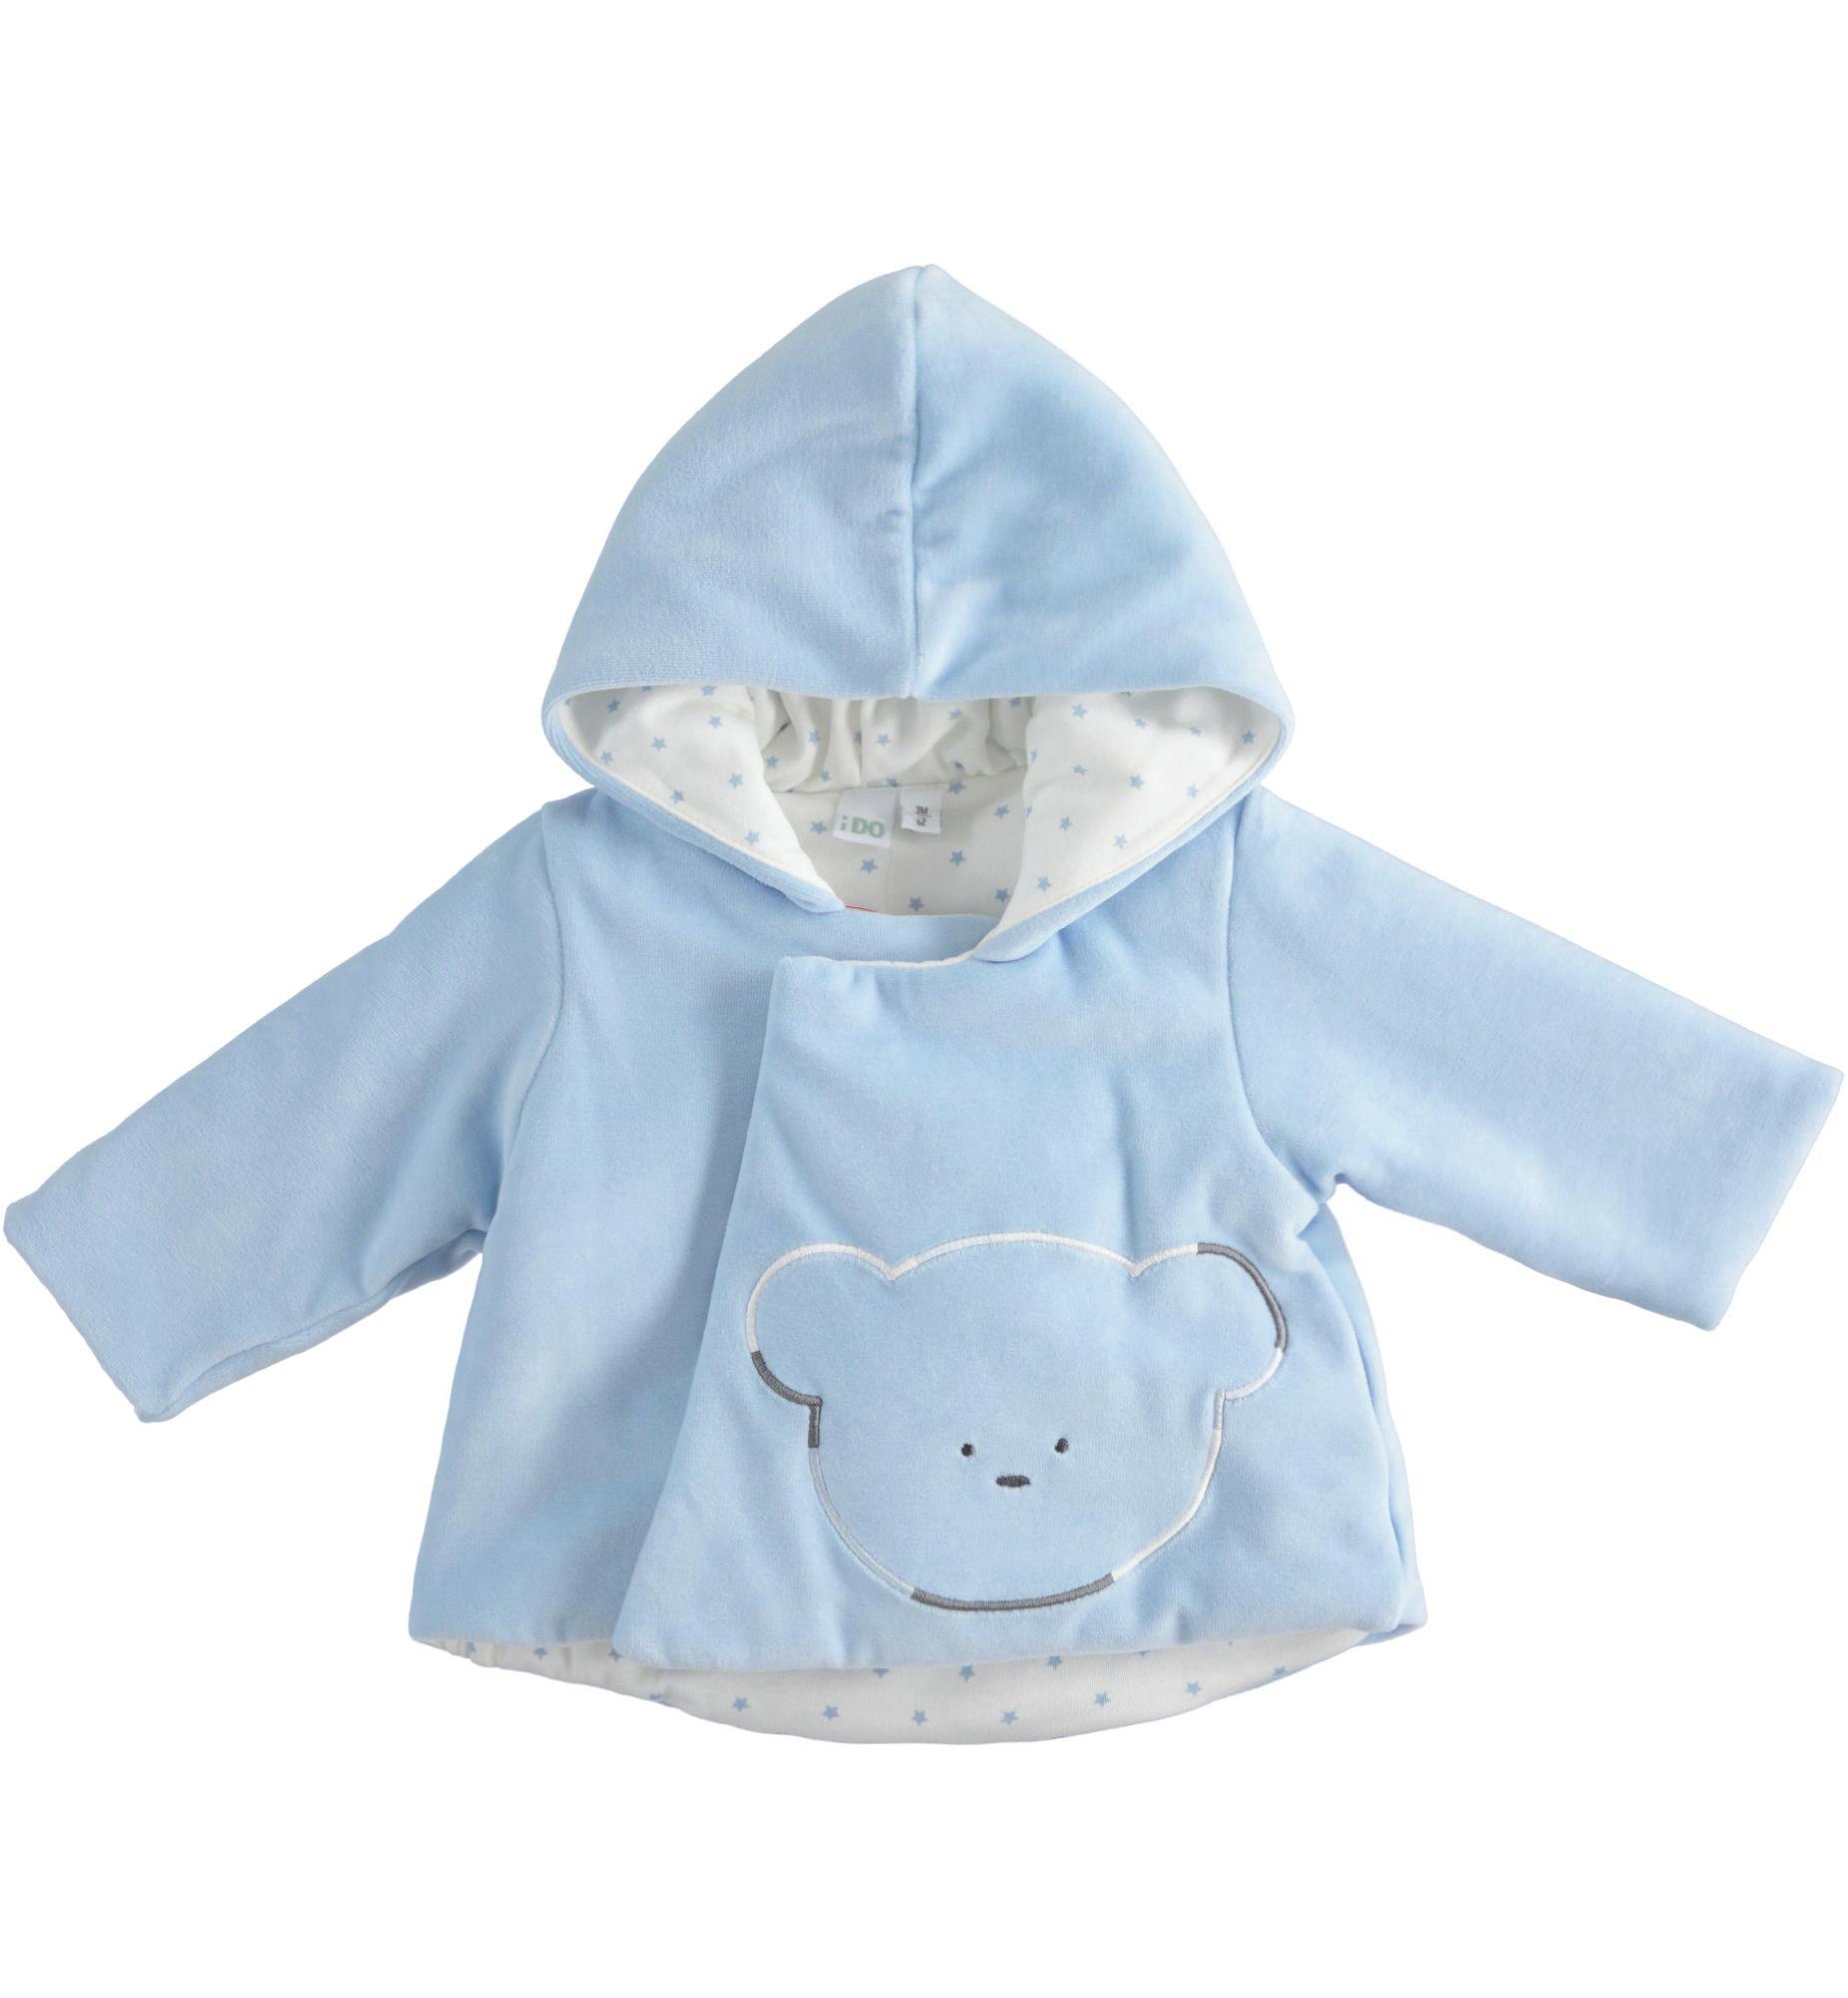 Ido iDO Blue Velour Bear Jacket - 43298